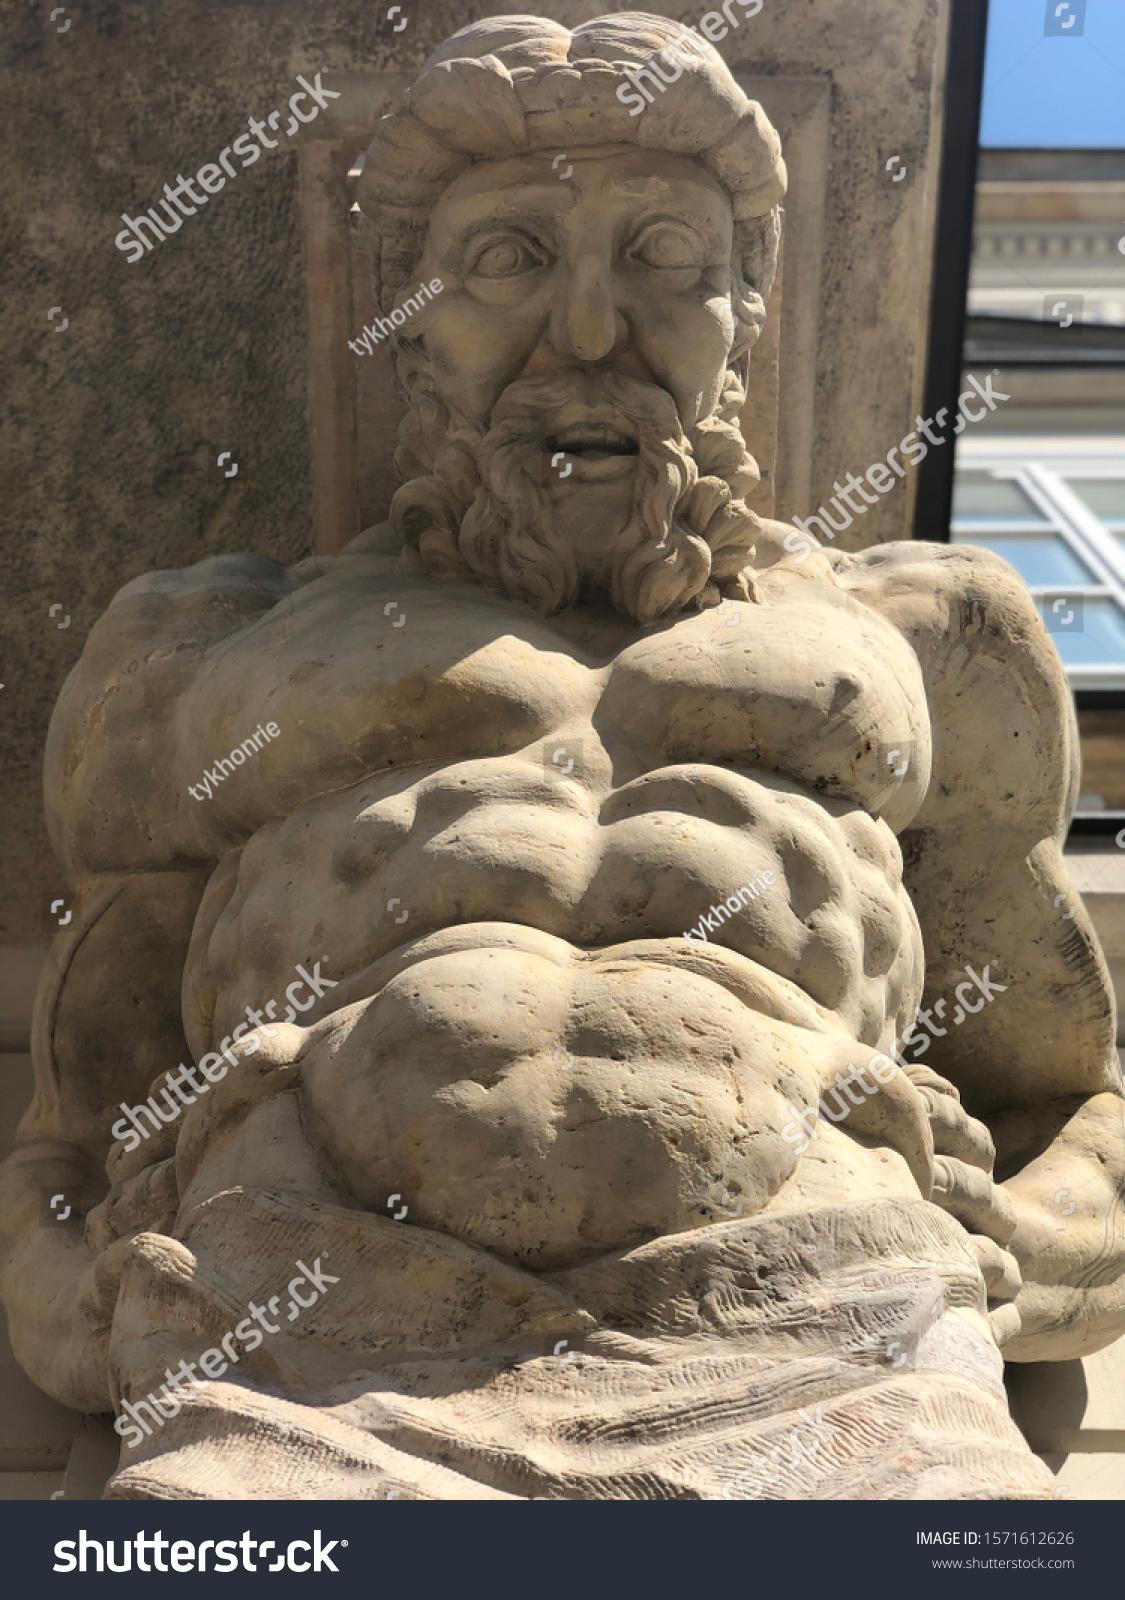 stock-photo-stone-statue-of-greek-man-sc